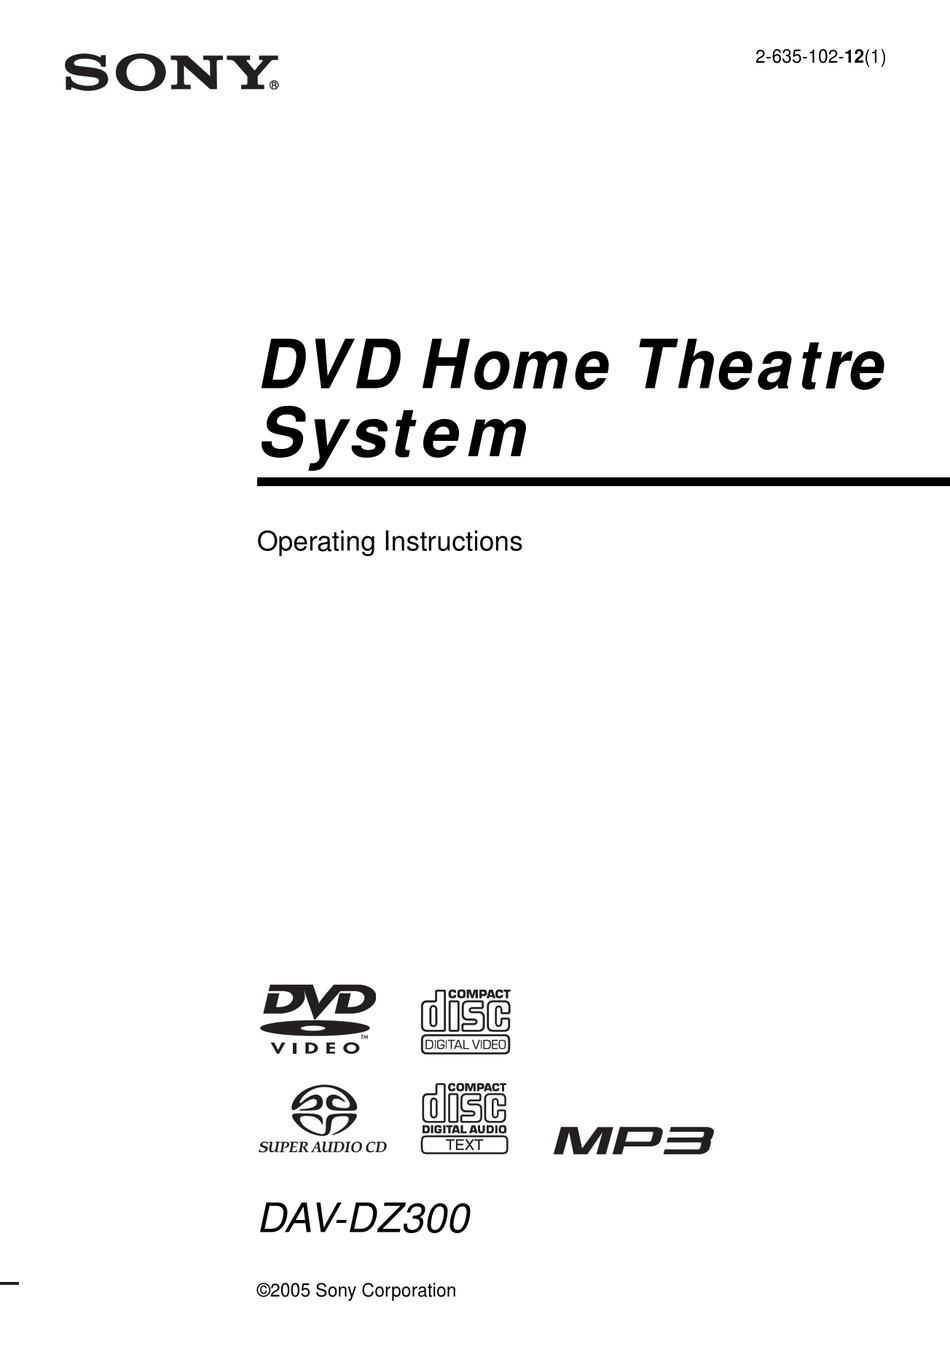 SONY DAV-DZ300 OPERATING INSTRUCTIONS MANUAL Pdf Download